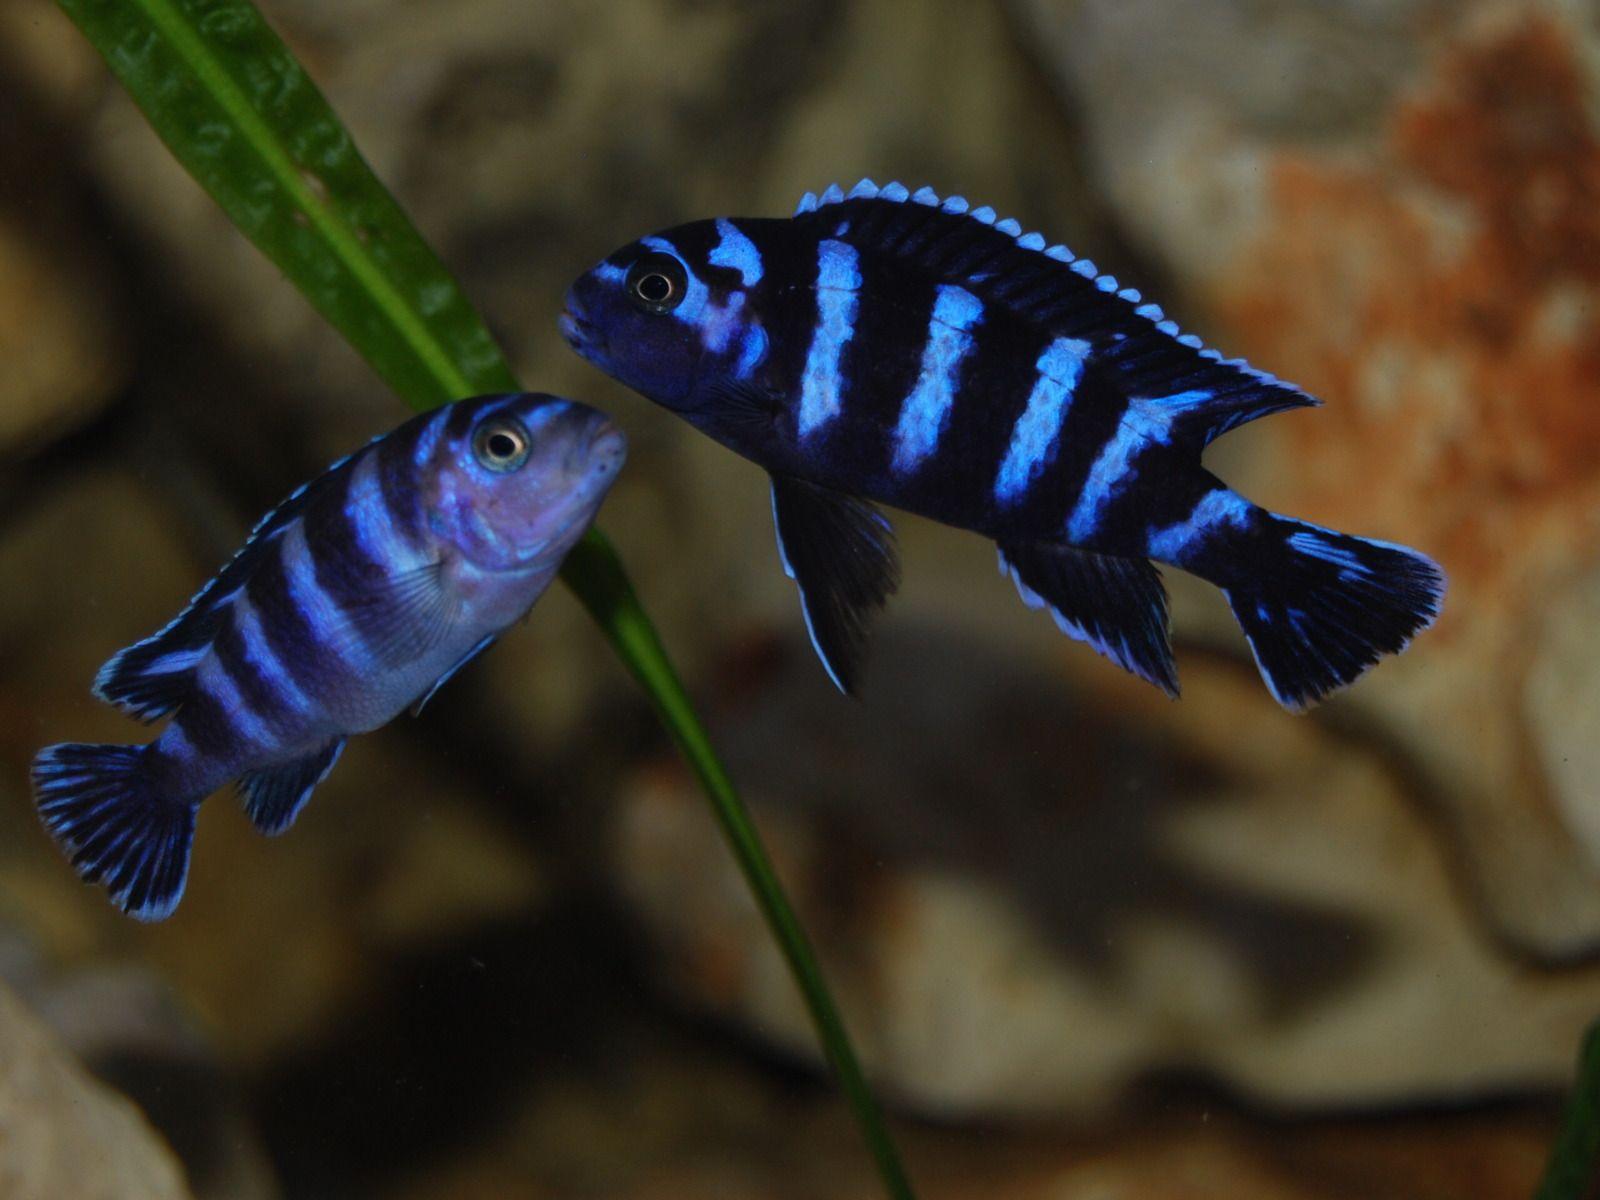 Cool Demasoni Pombo  Pseudotropheus Demasoni Malawi Cichlidsafrican Cichlidsaquarium Fishtropical